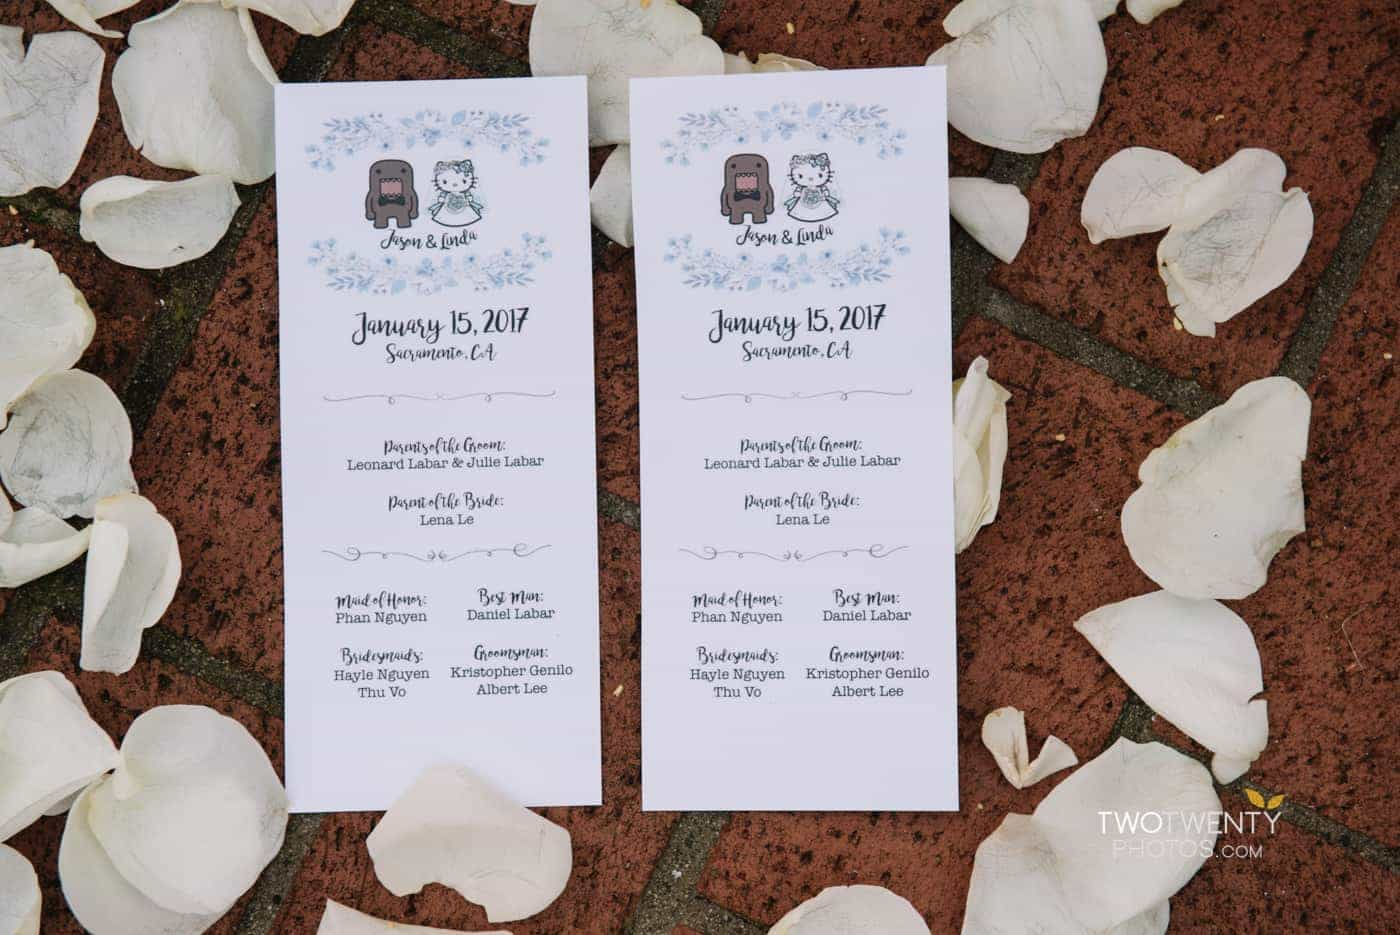 vizcaya-pavilion-sacramento-wedding-photographer-8